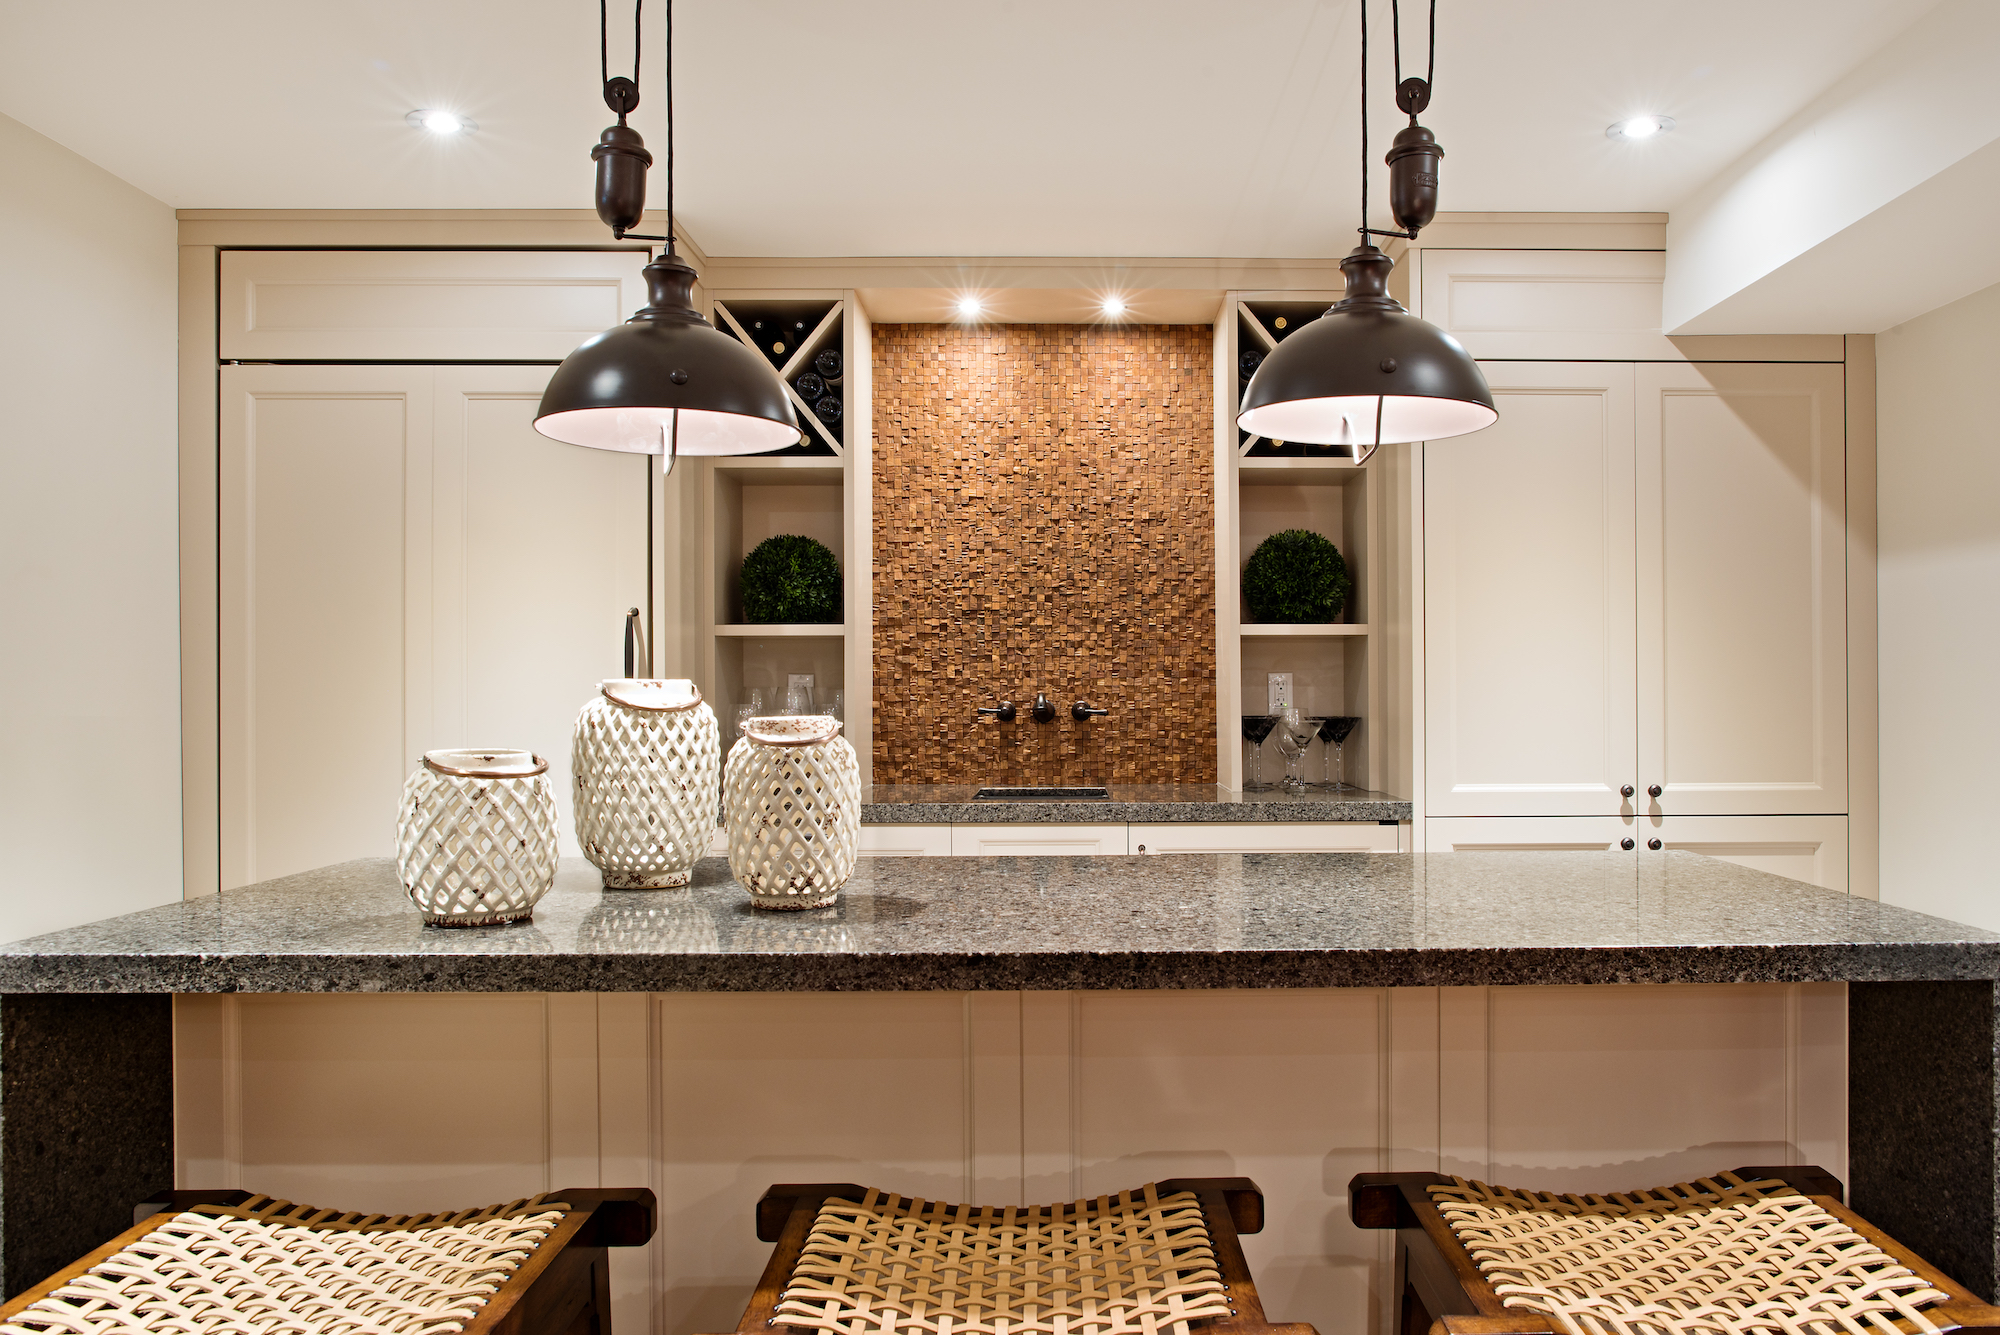 3 Pizzale Design Interior Decorating  Kitchen brown unique texture african.jpg